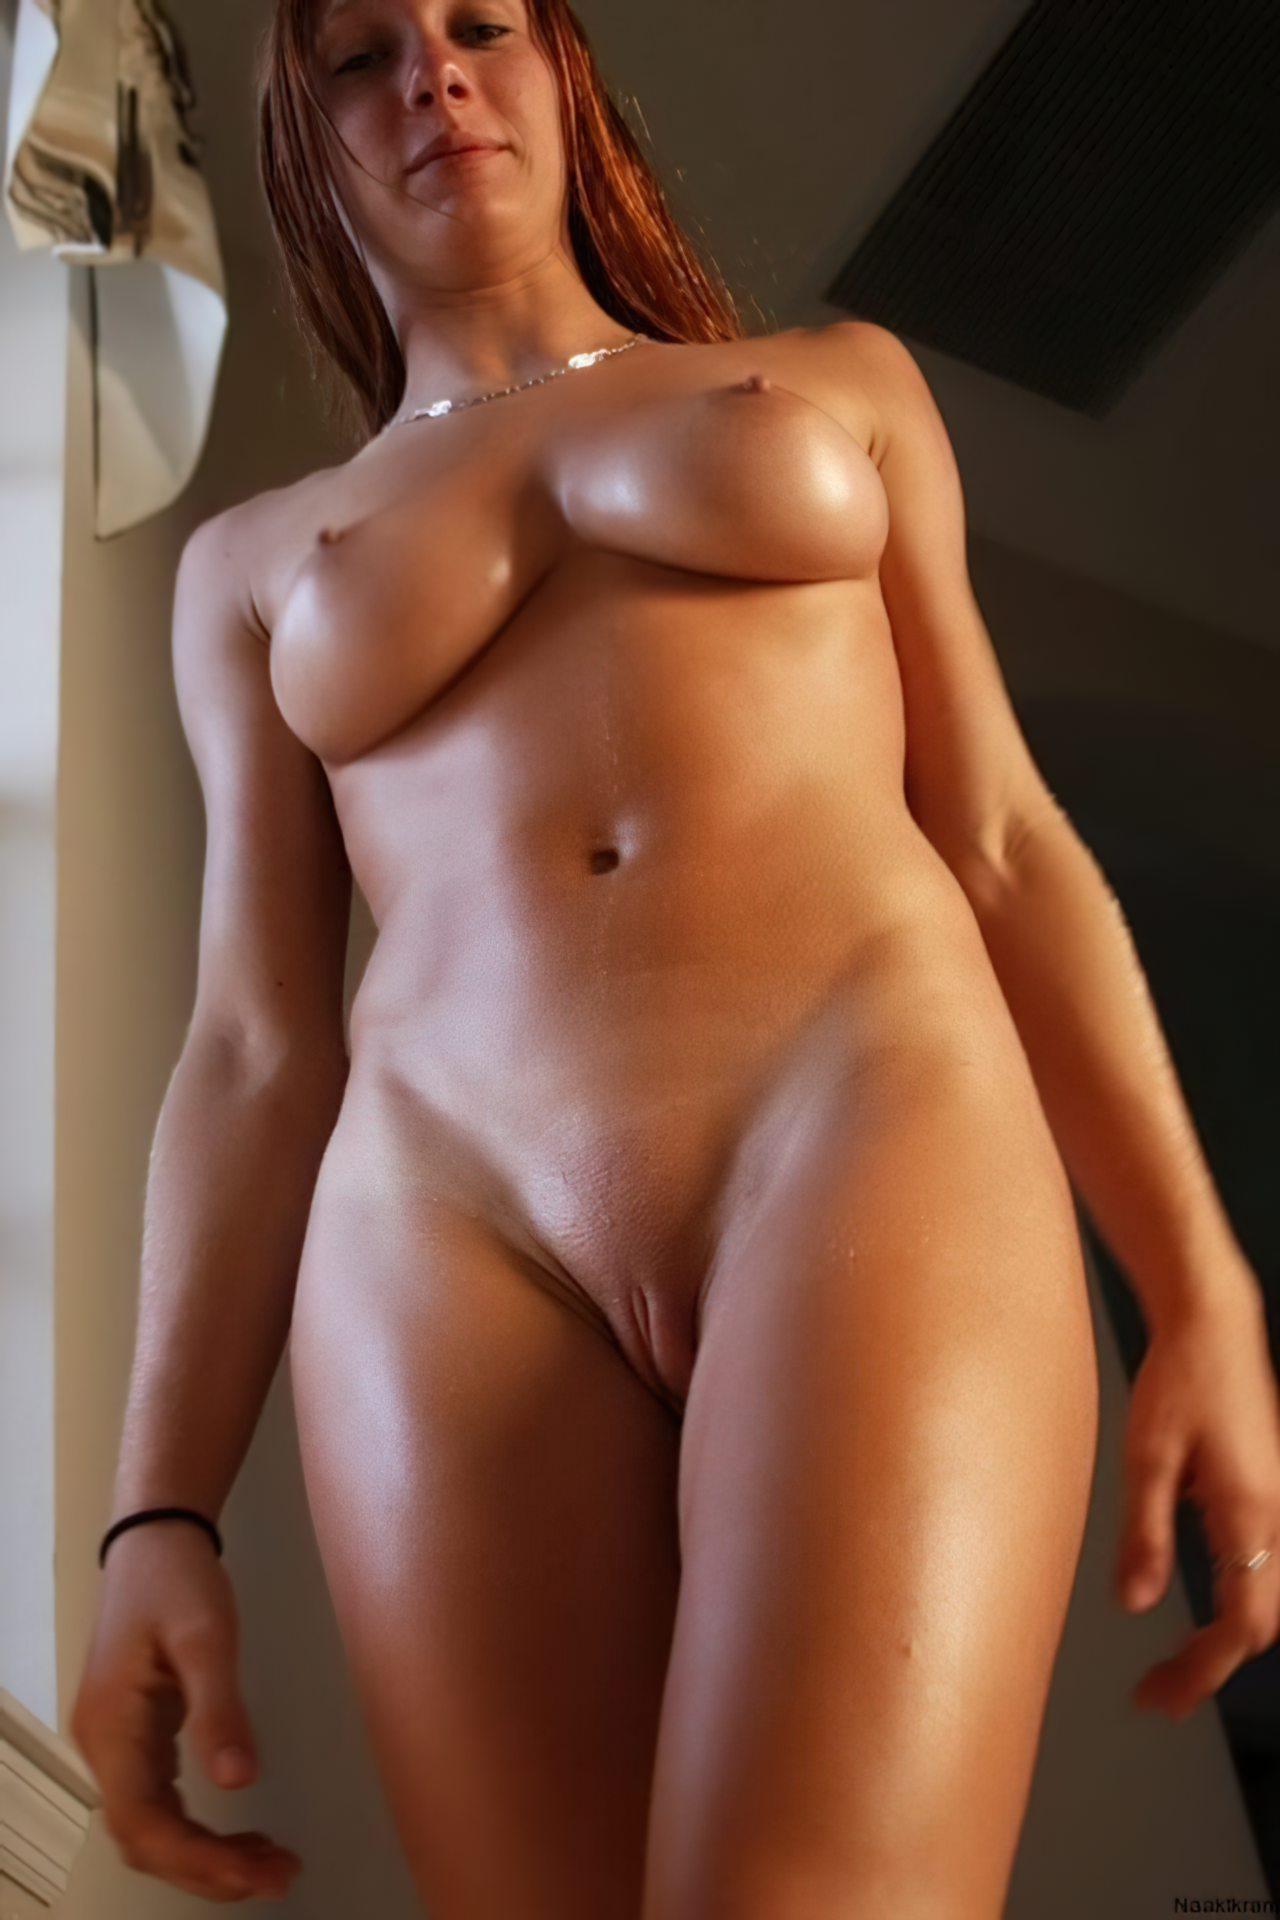 Fotos de Mulheres Nuas (27)